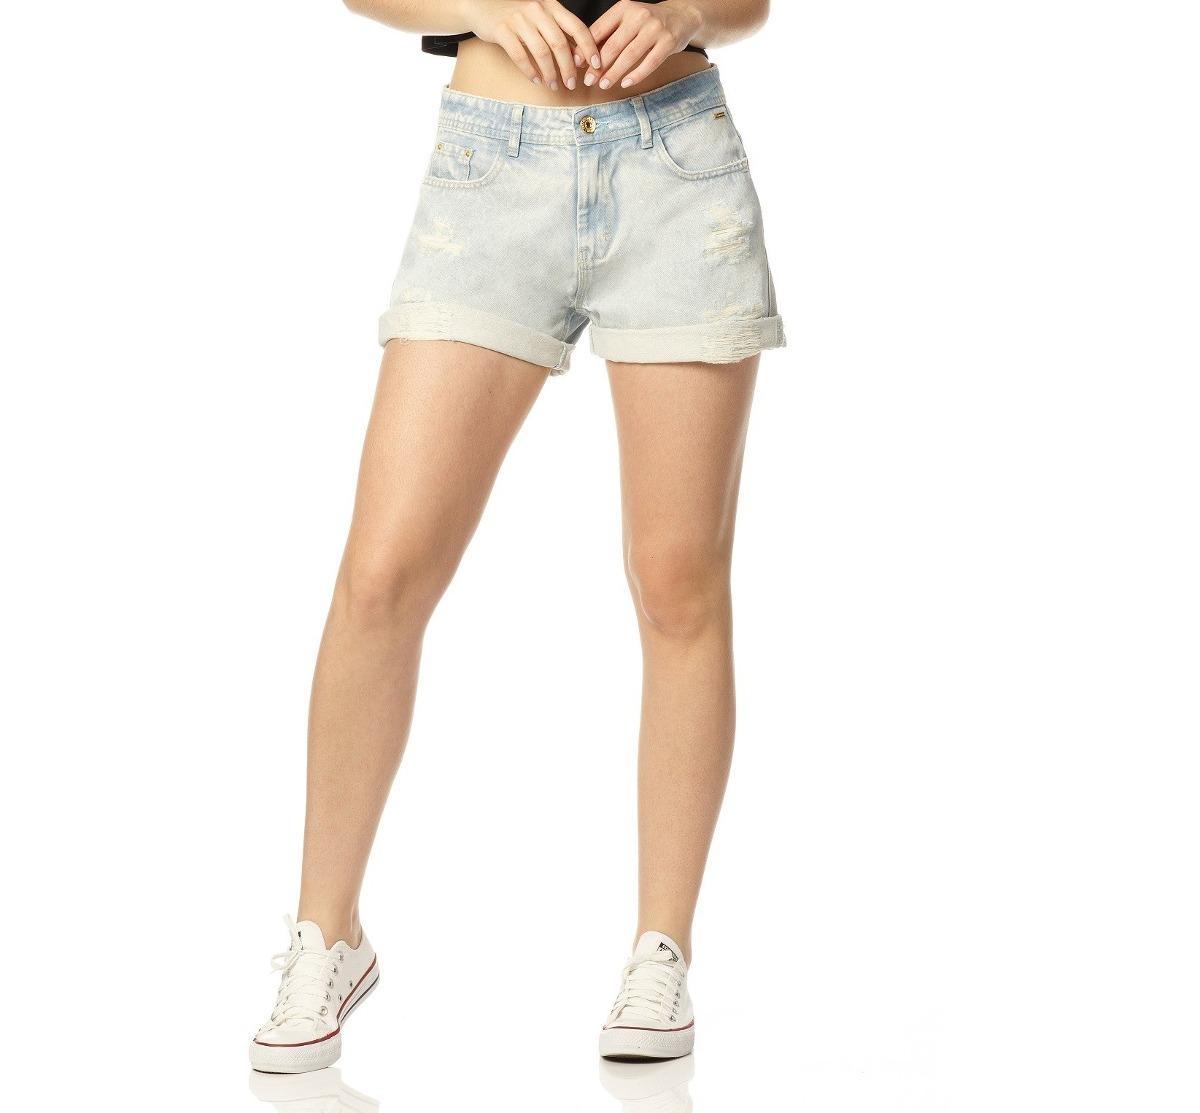 dfaa9d04a Shorts Jeans Feminino Boyfriend Sobreposto-sp6159 - R$ 114,90 em ...